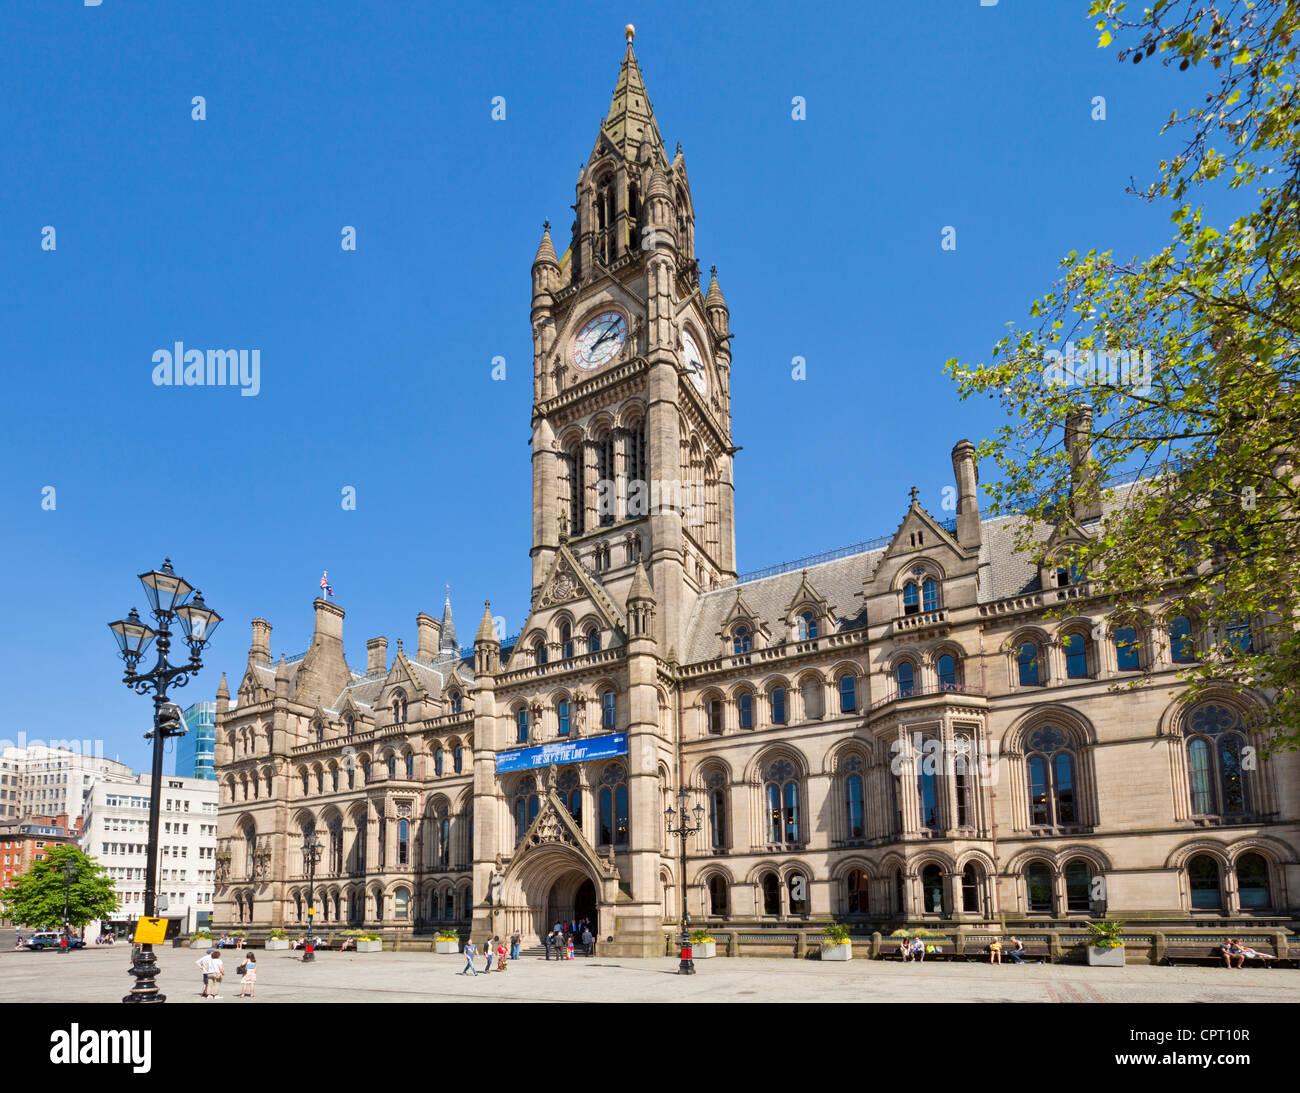 Rathaus von Manchester Albert Square Stadtzentrum von Manchester Manchester England UK GB EU Großeuropa Stockbild